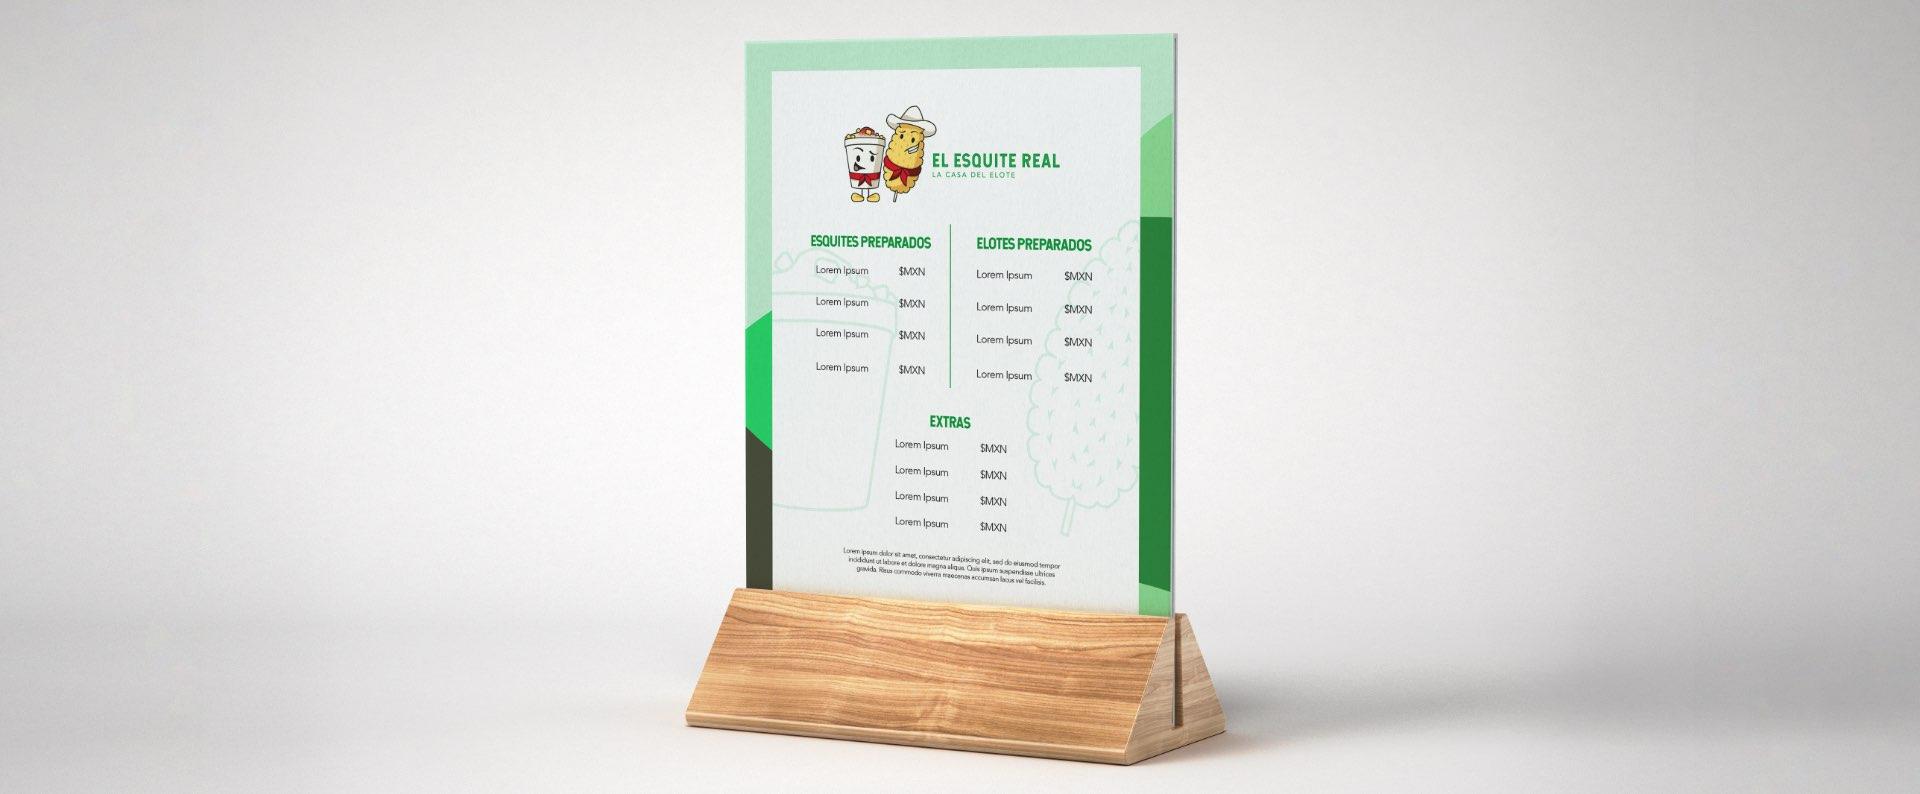 menu esquite real